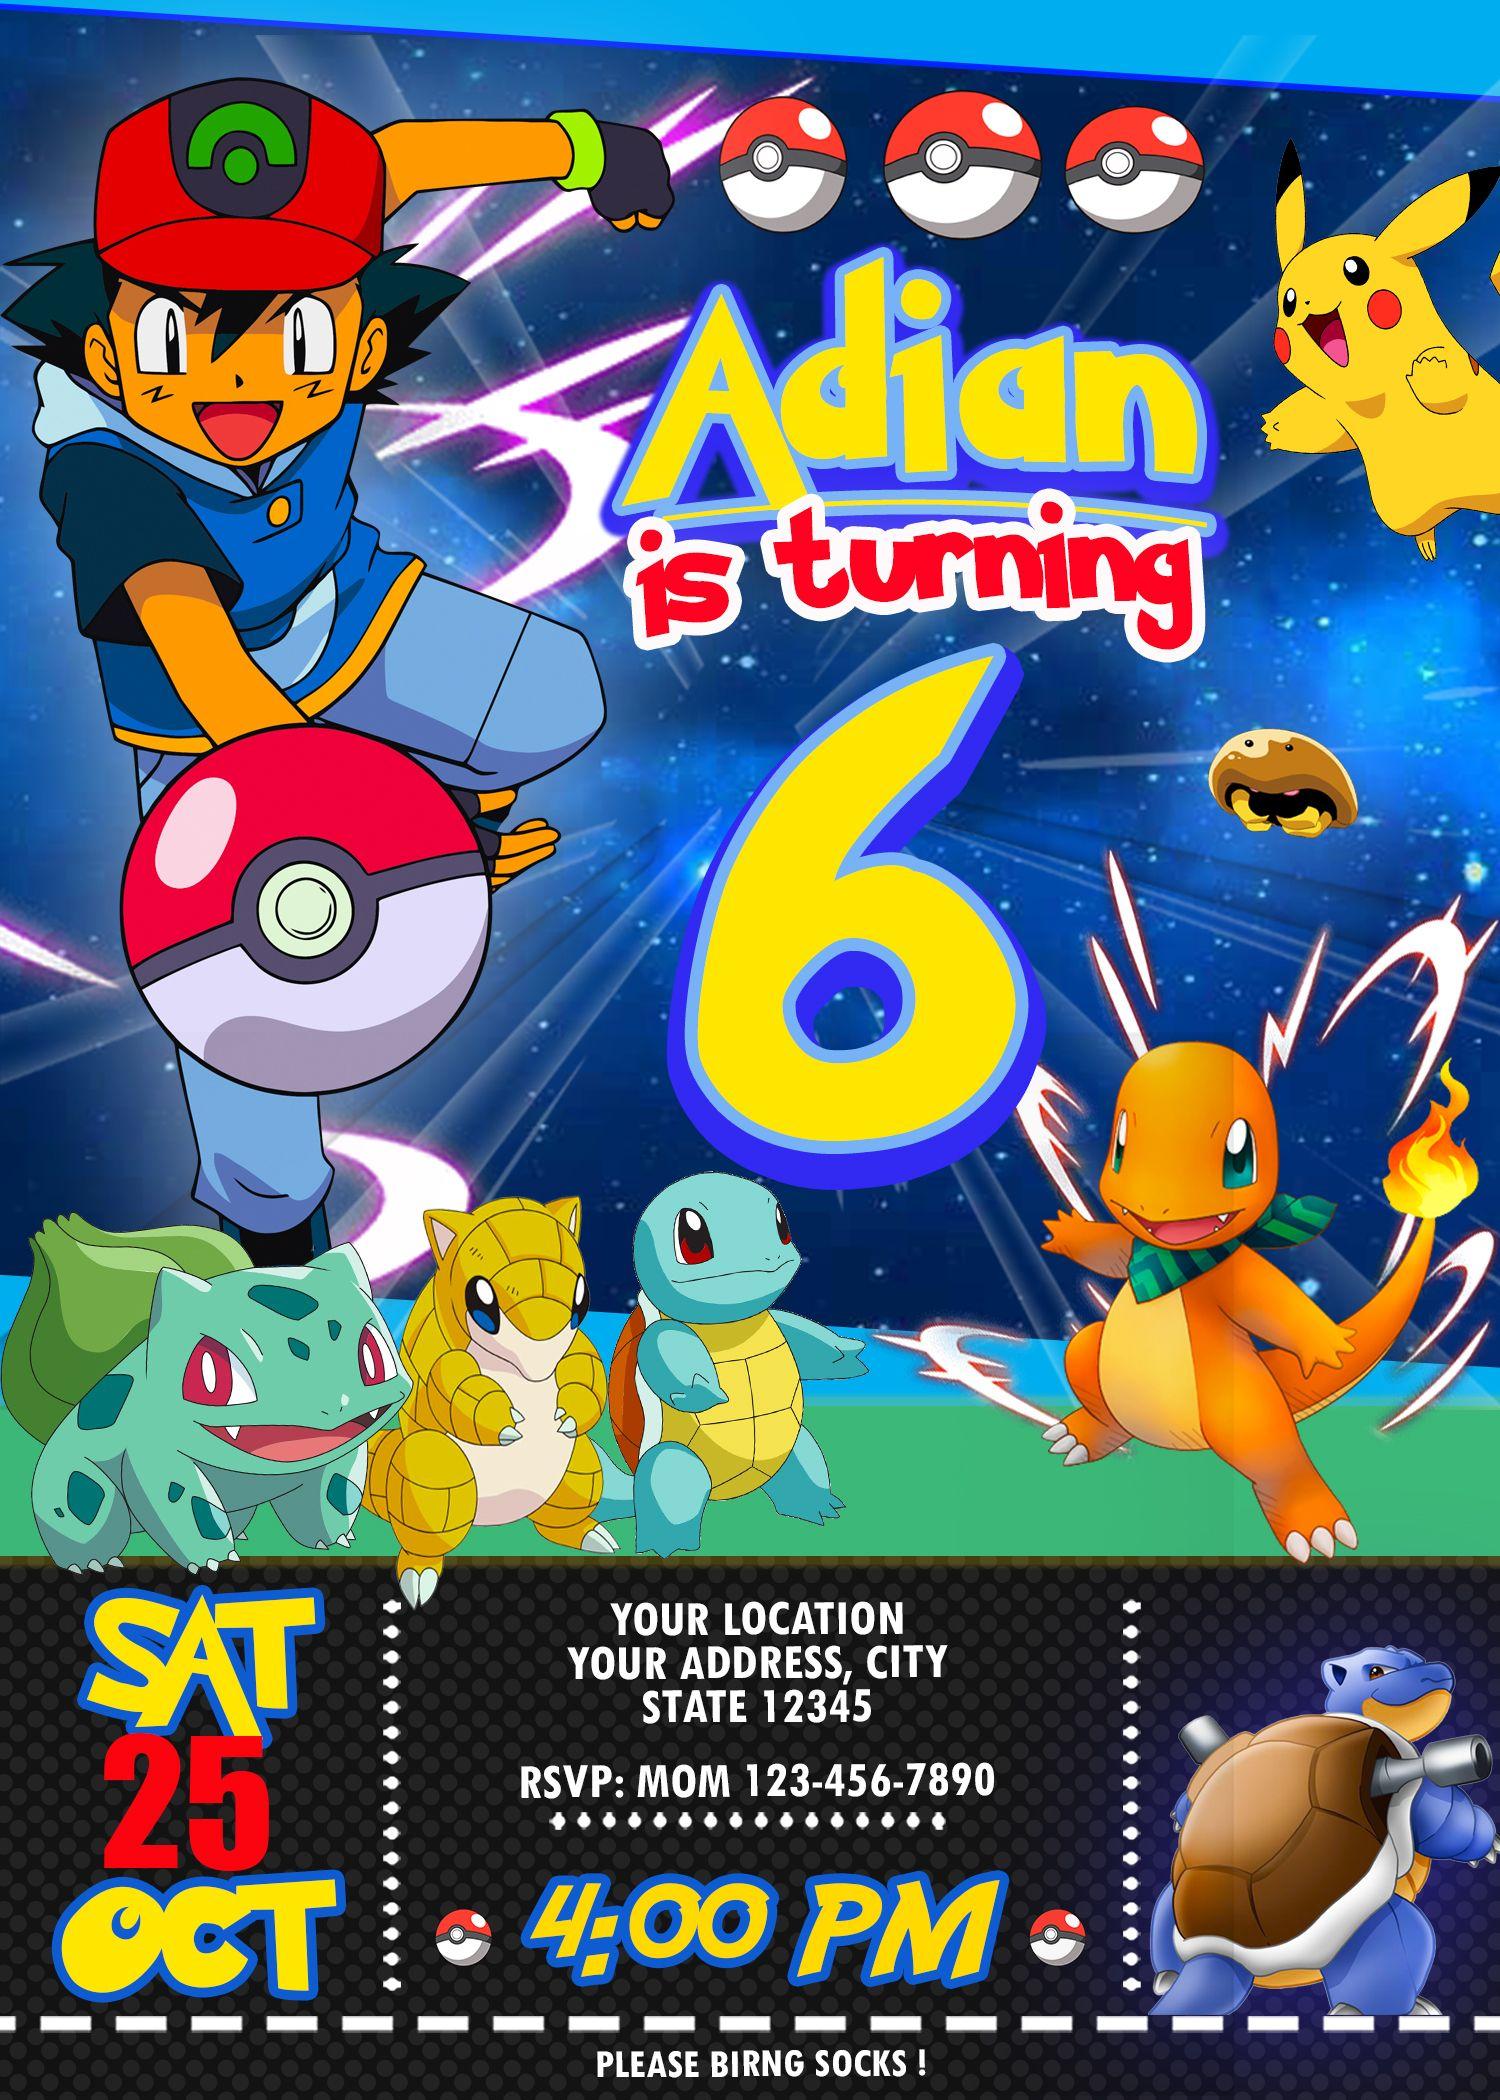 Pokemon Birthday Invitation Oscarsitosroom Pokemon Birthday Party Pokemon Birthday Invites Pokemon Themed Party